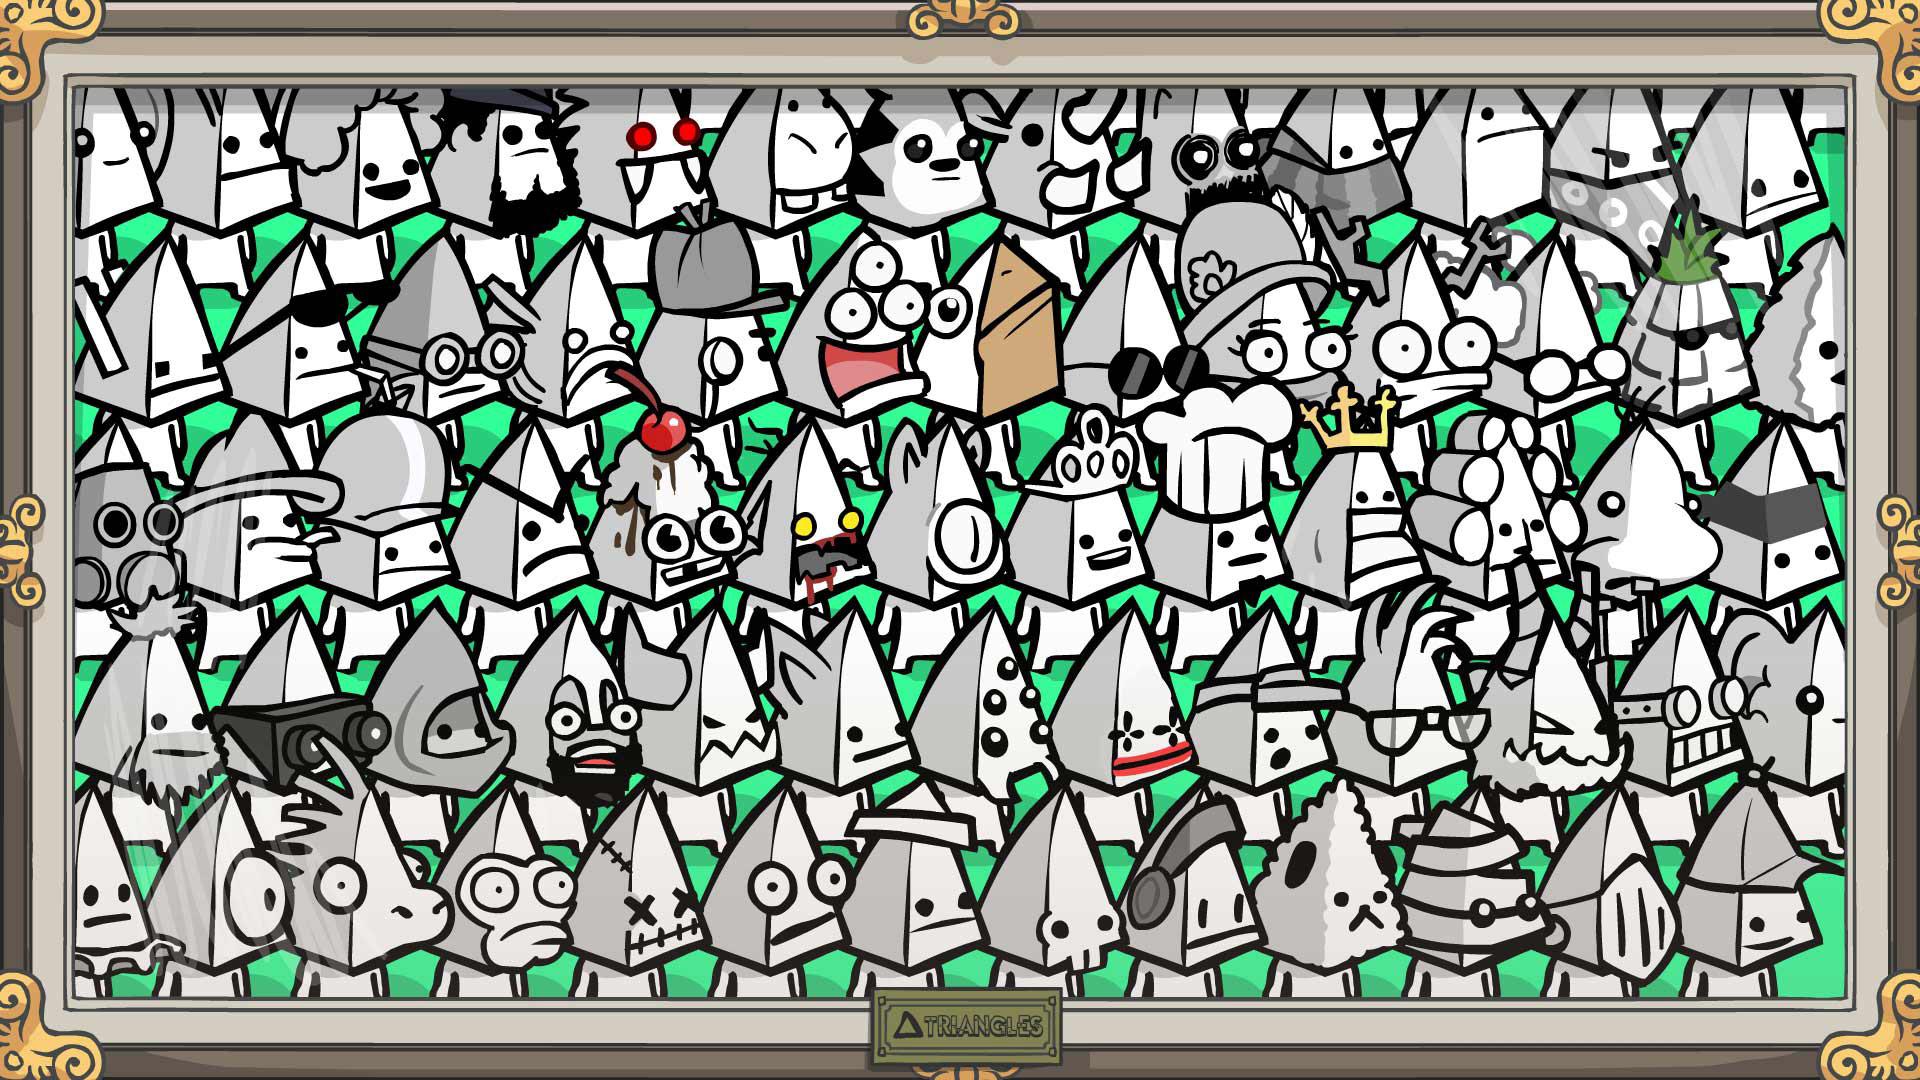 Free Battleblock Theater Wallpaper in 1920x1080